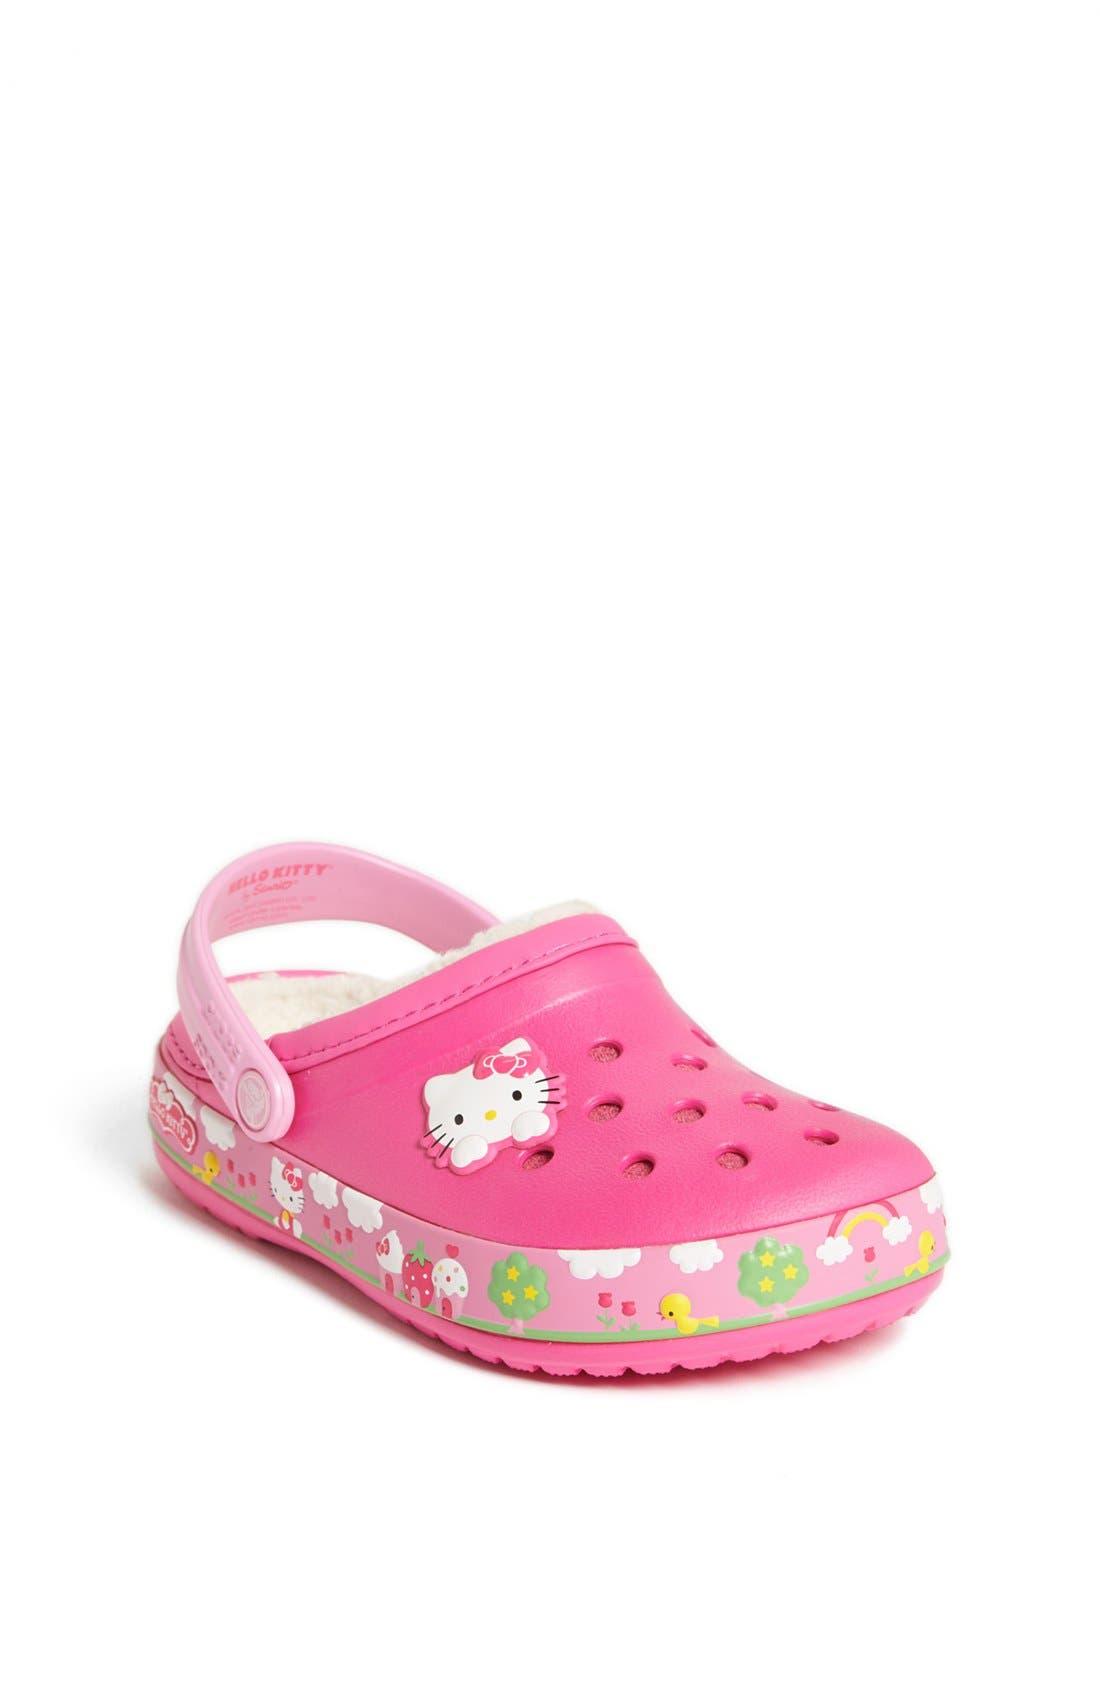 Alternate Image 1 Selected - CROCS™ 'Mammoth - Hello Kitty®' Clog (Walker & Toddler)